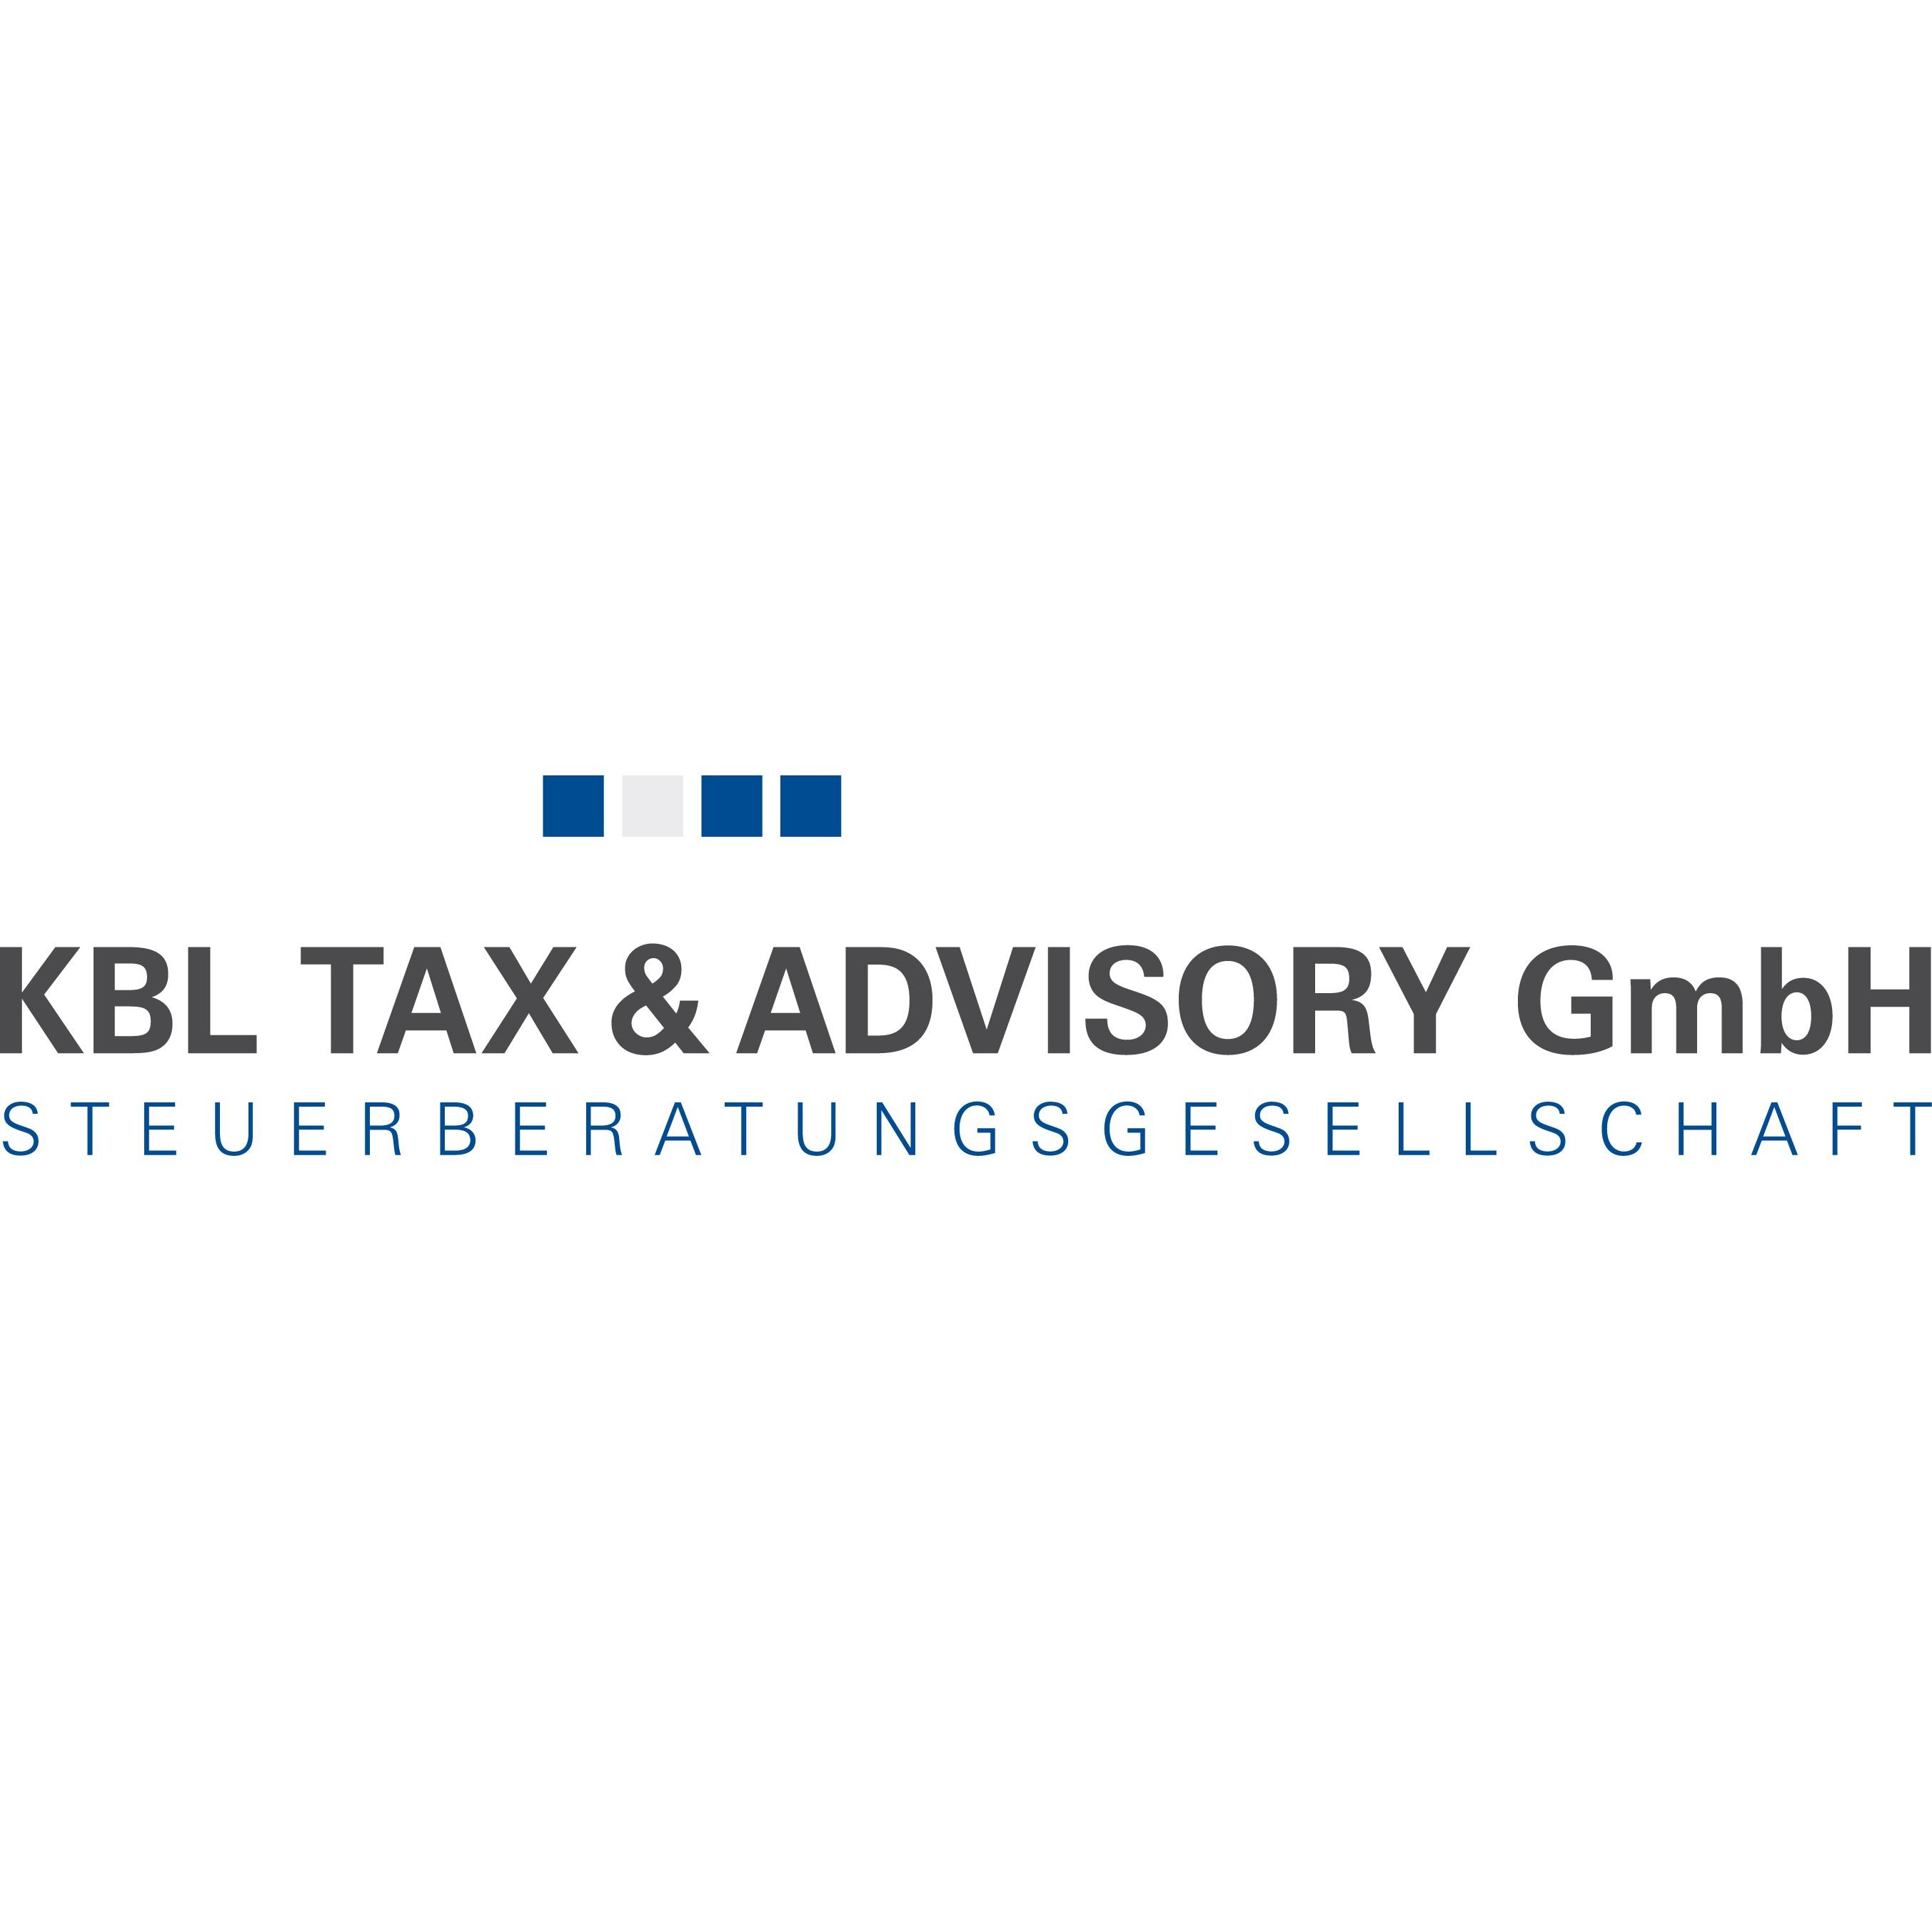 Bild zu KBL Tax & Advisory GmbH Steuerberatungsgesellschaft in Würzburg